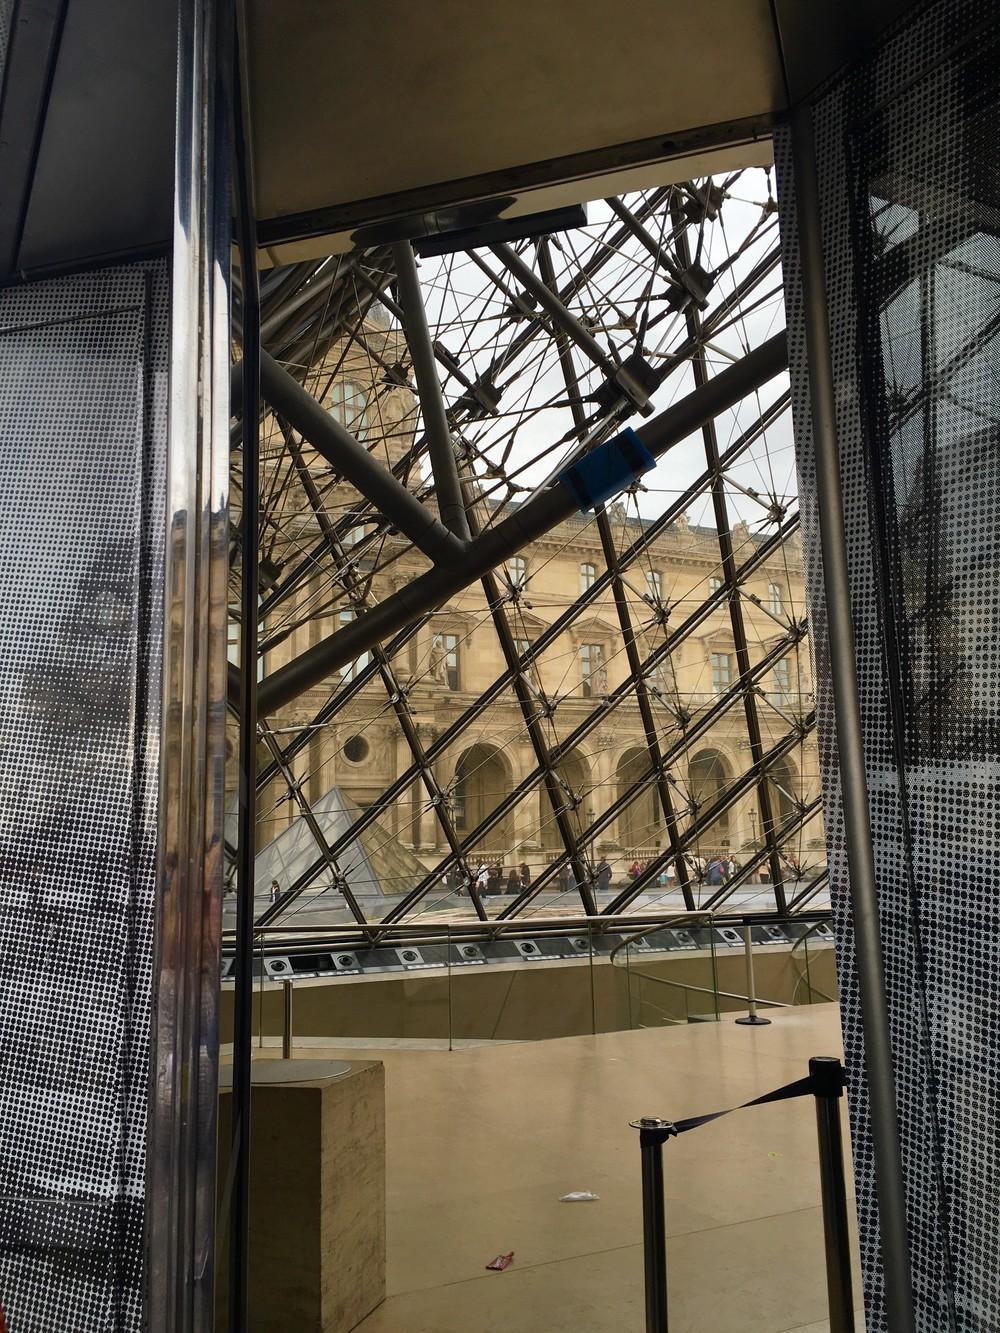 jr-artiste-contemporain-art-photo-restaurarte-galerie-perrotin-paris-le-havre-decade-louvre-restauration-anamorphose.jpg